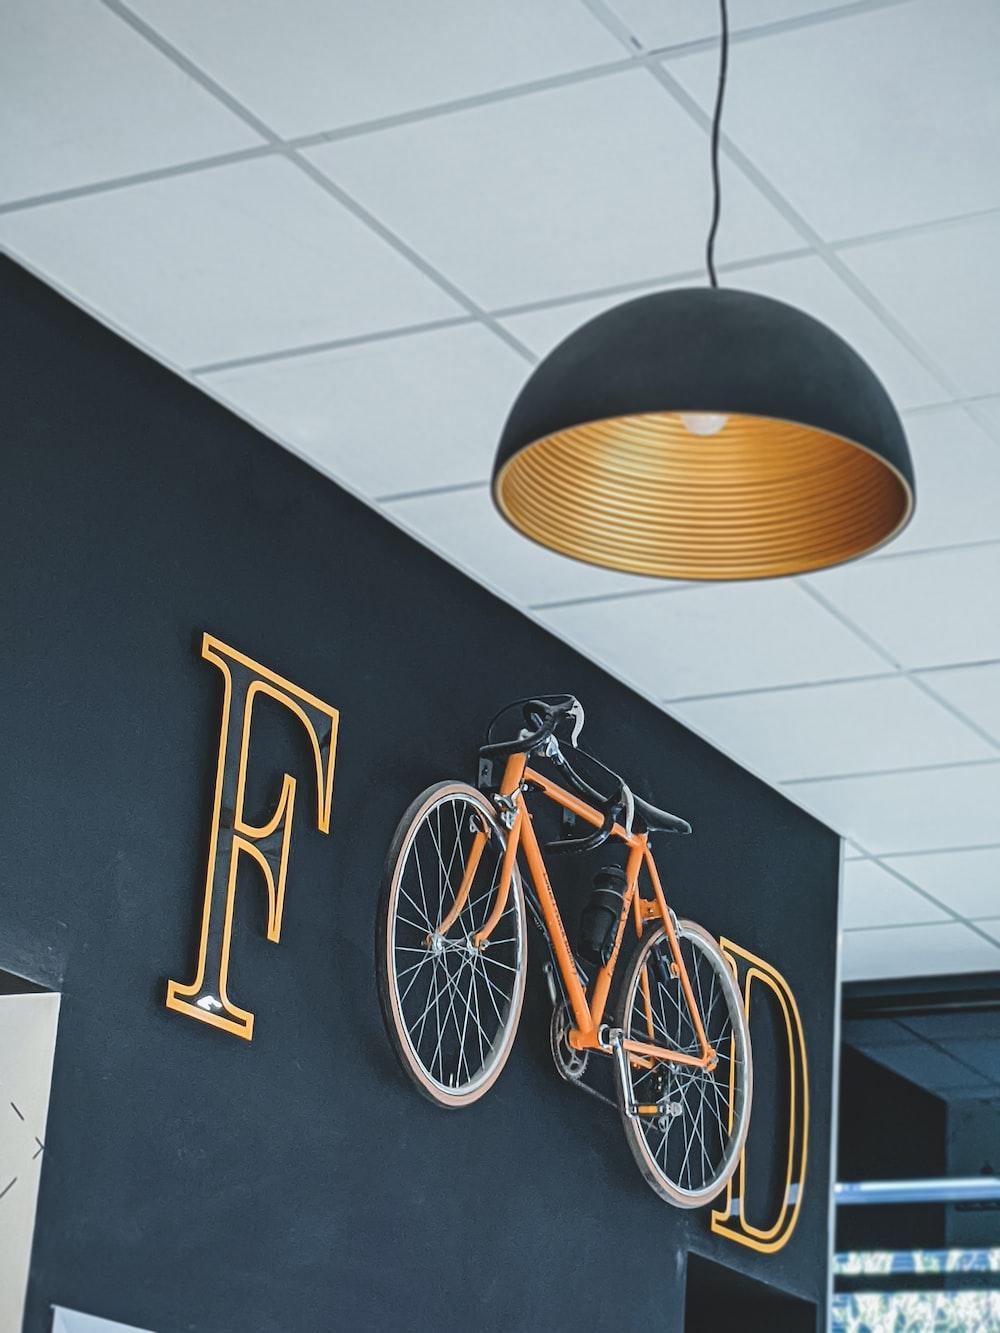 yellow city bike on white floor tiles